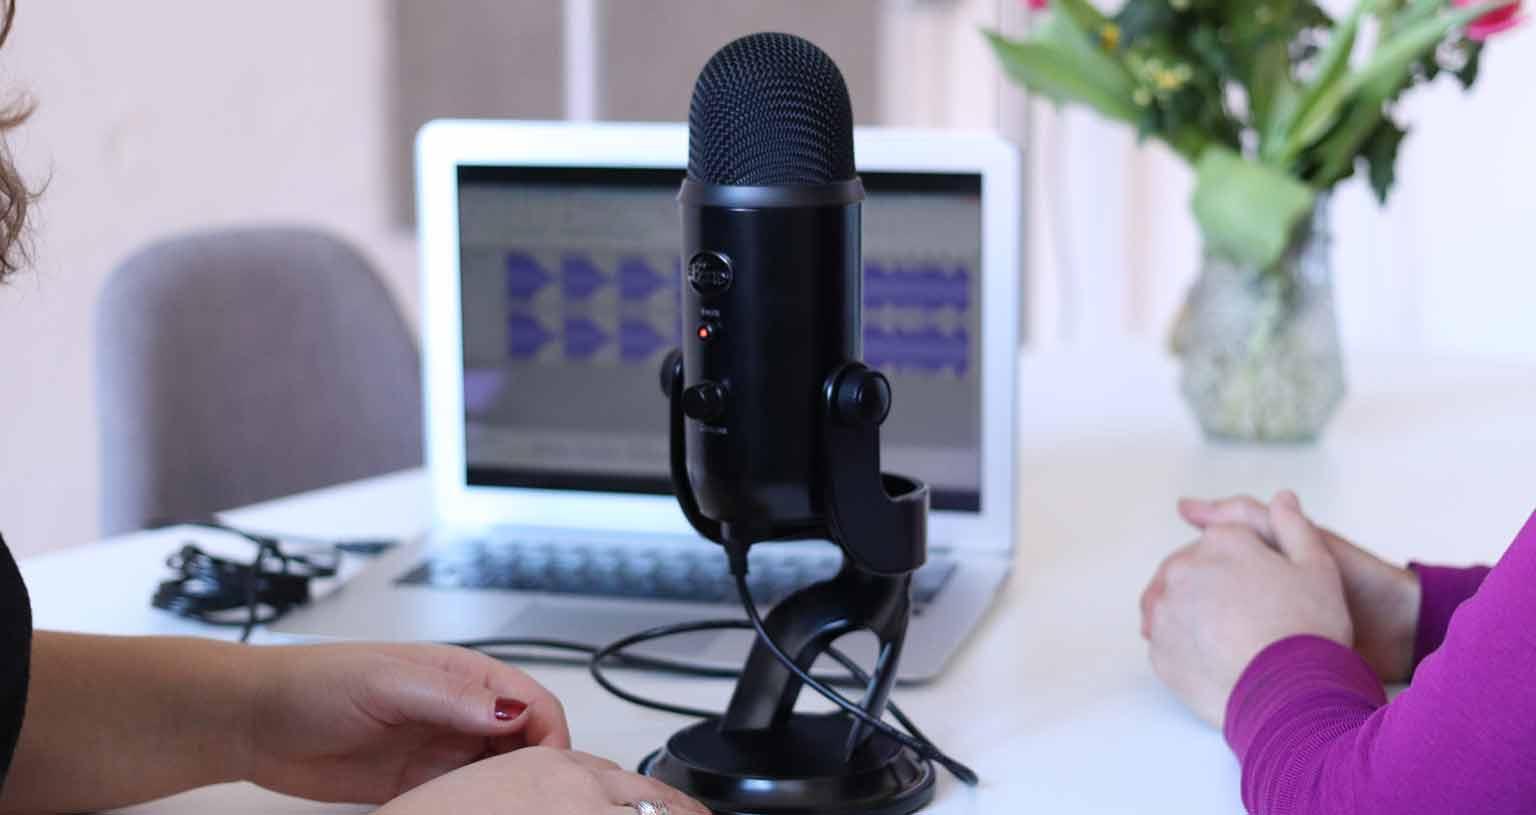 podcast-jobs-unterwegs-digital-arbeiten-vanlife-reisen-online-coach